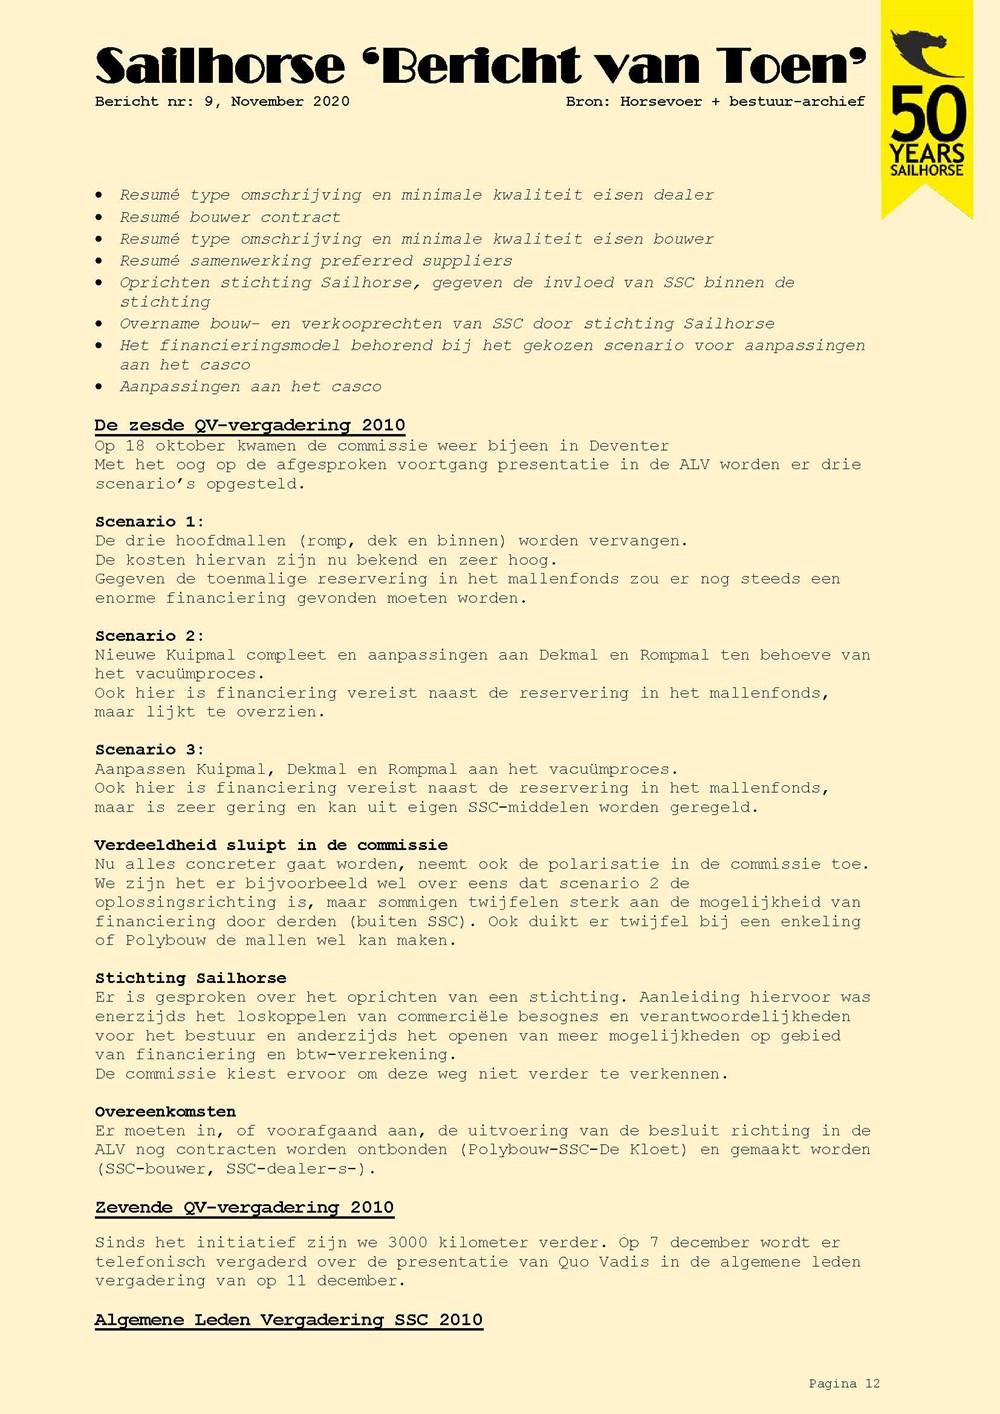 BvT09_Page_12.jpg